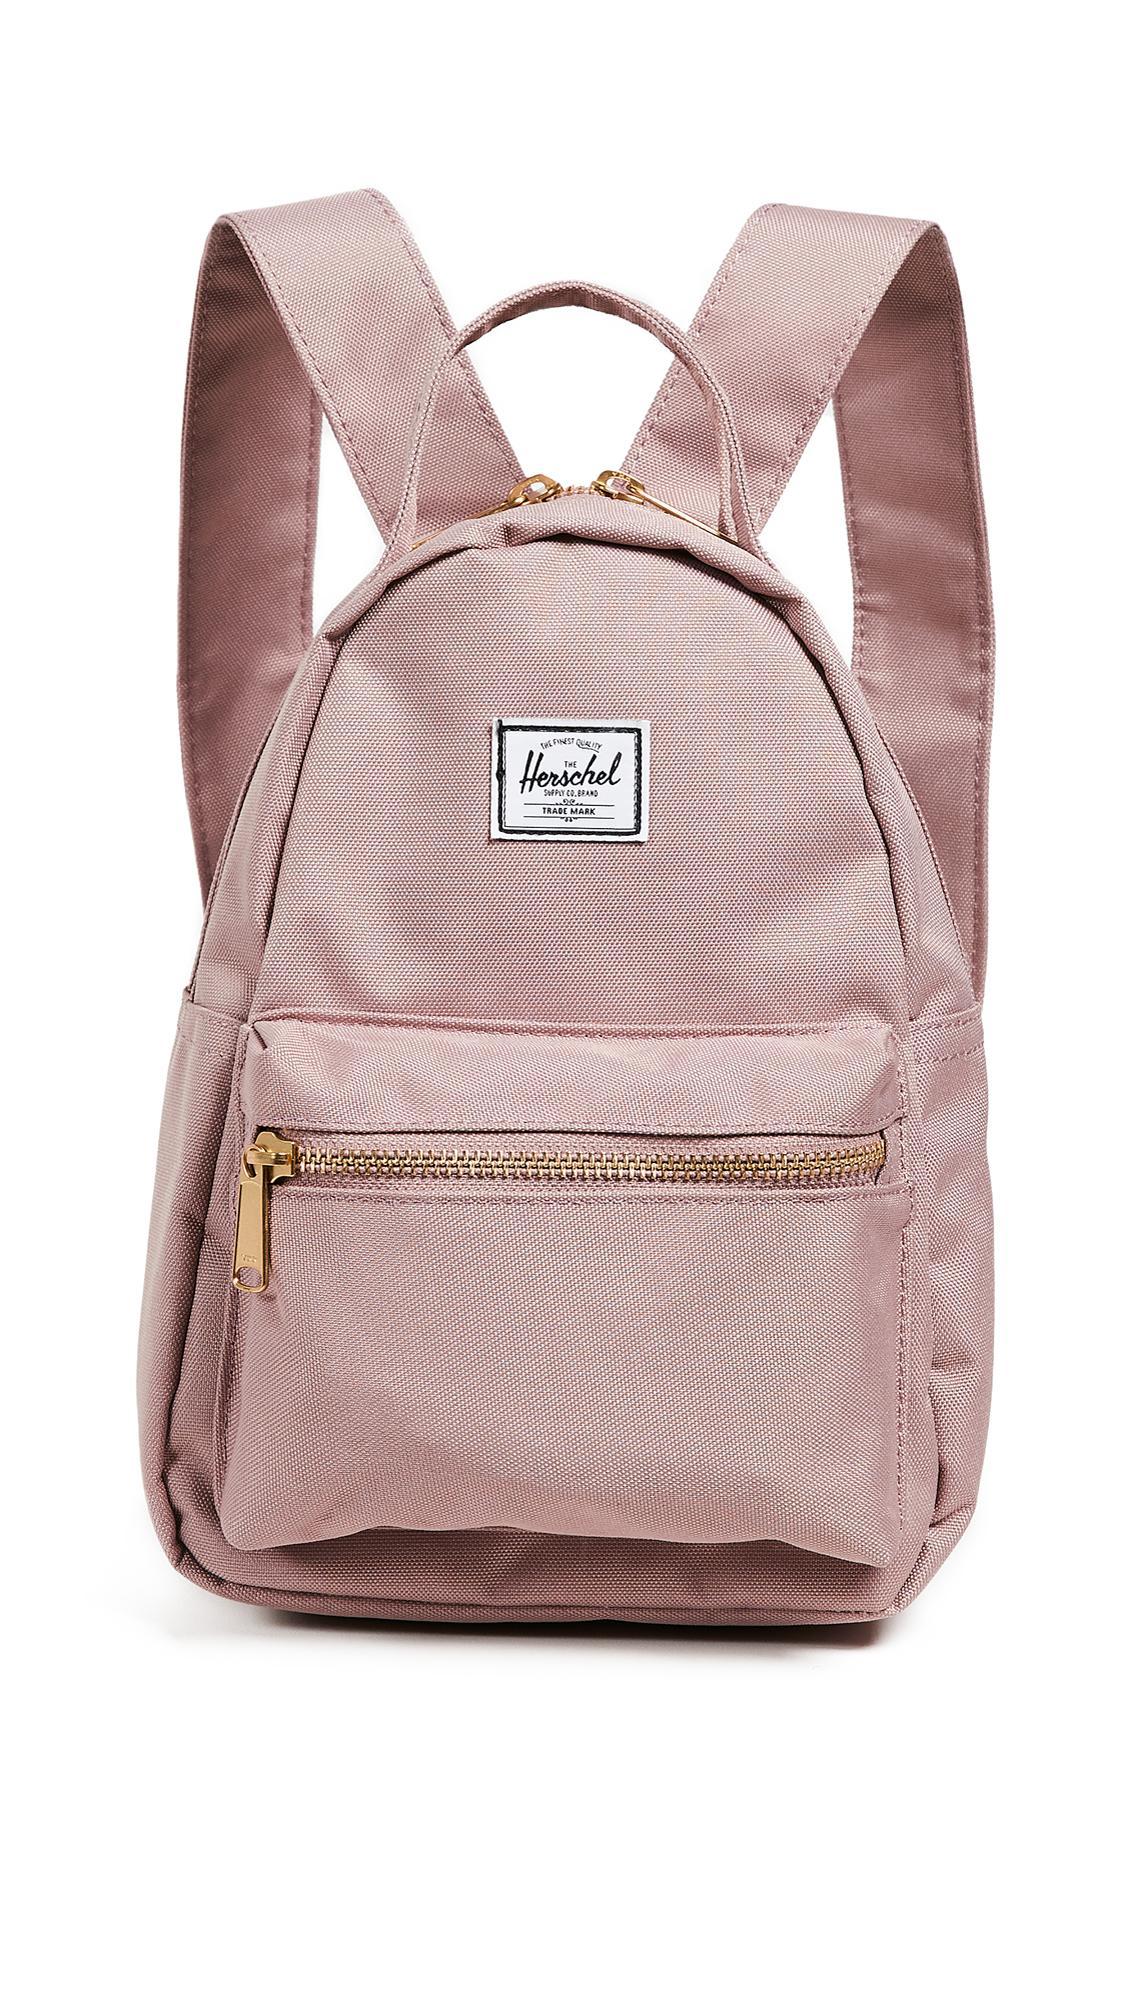 650375cf258 Herschel Supply Co. Nova Mini Backpack In Ash Rose